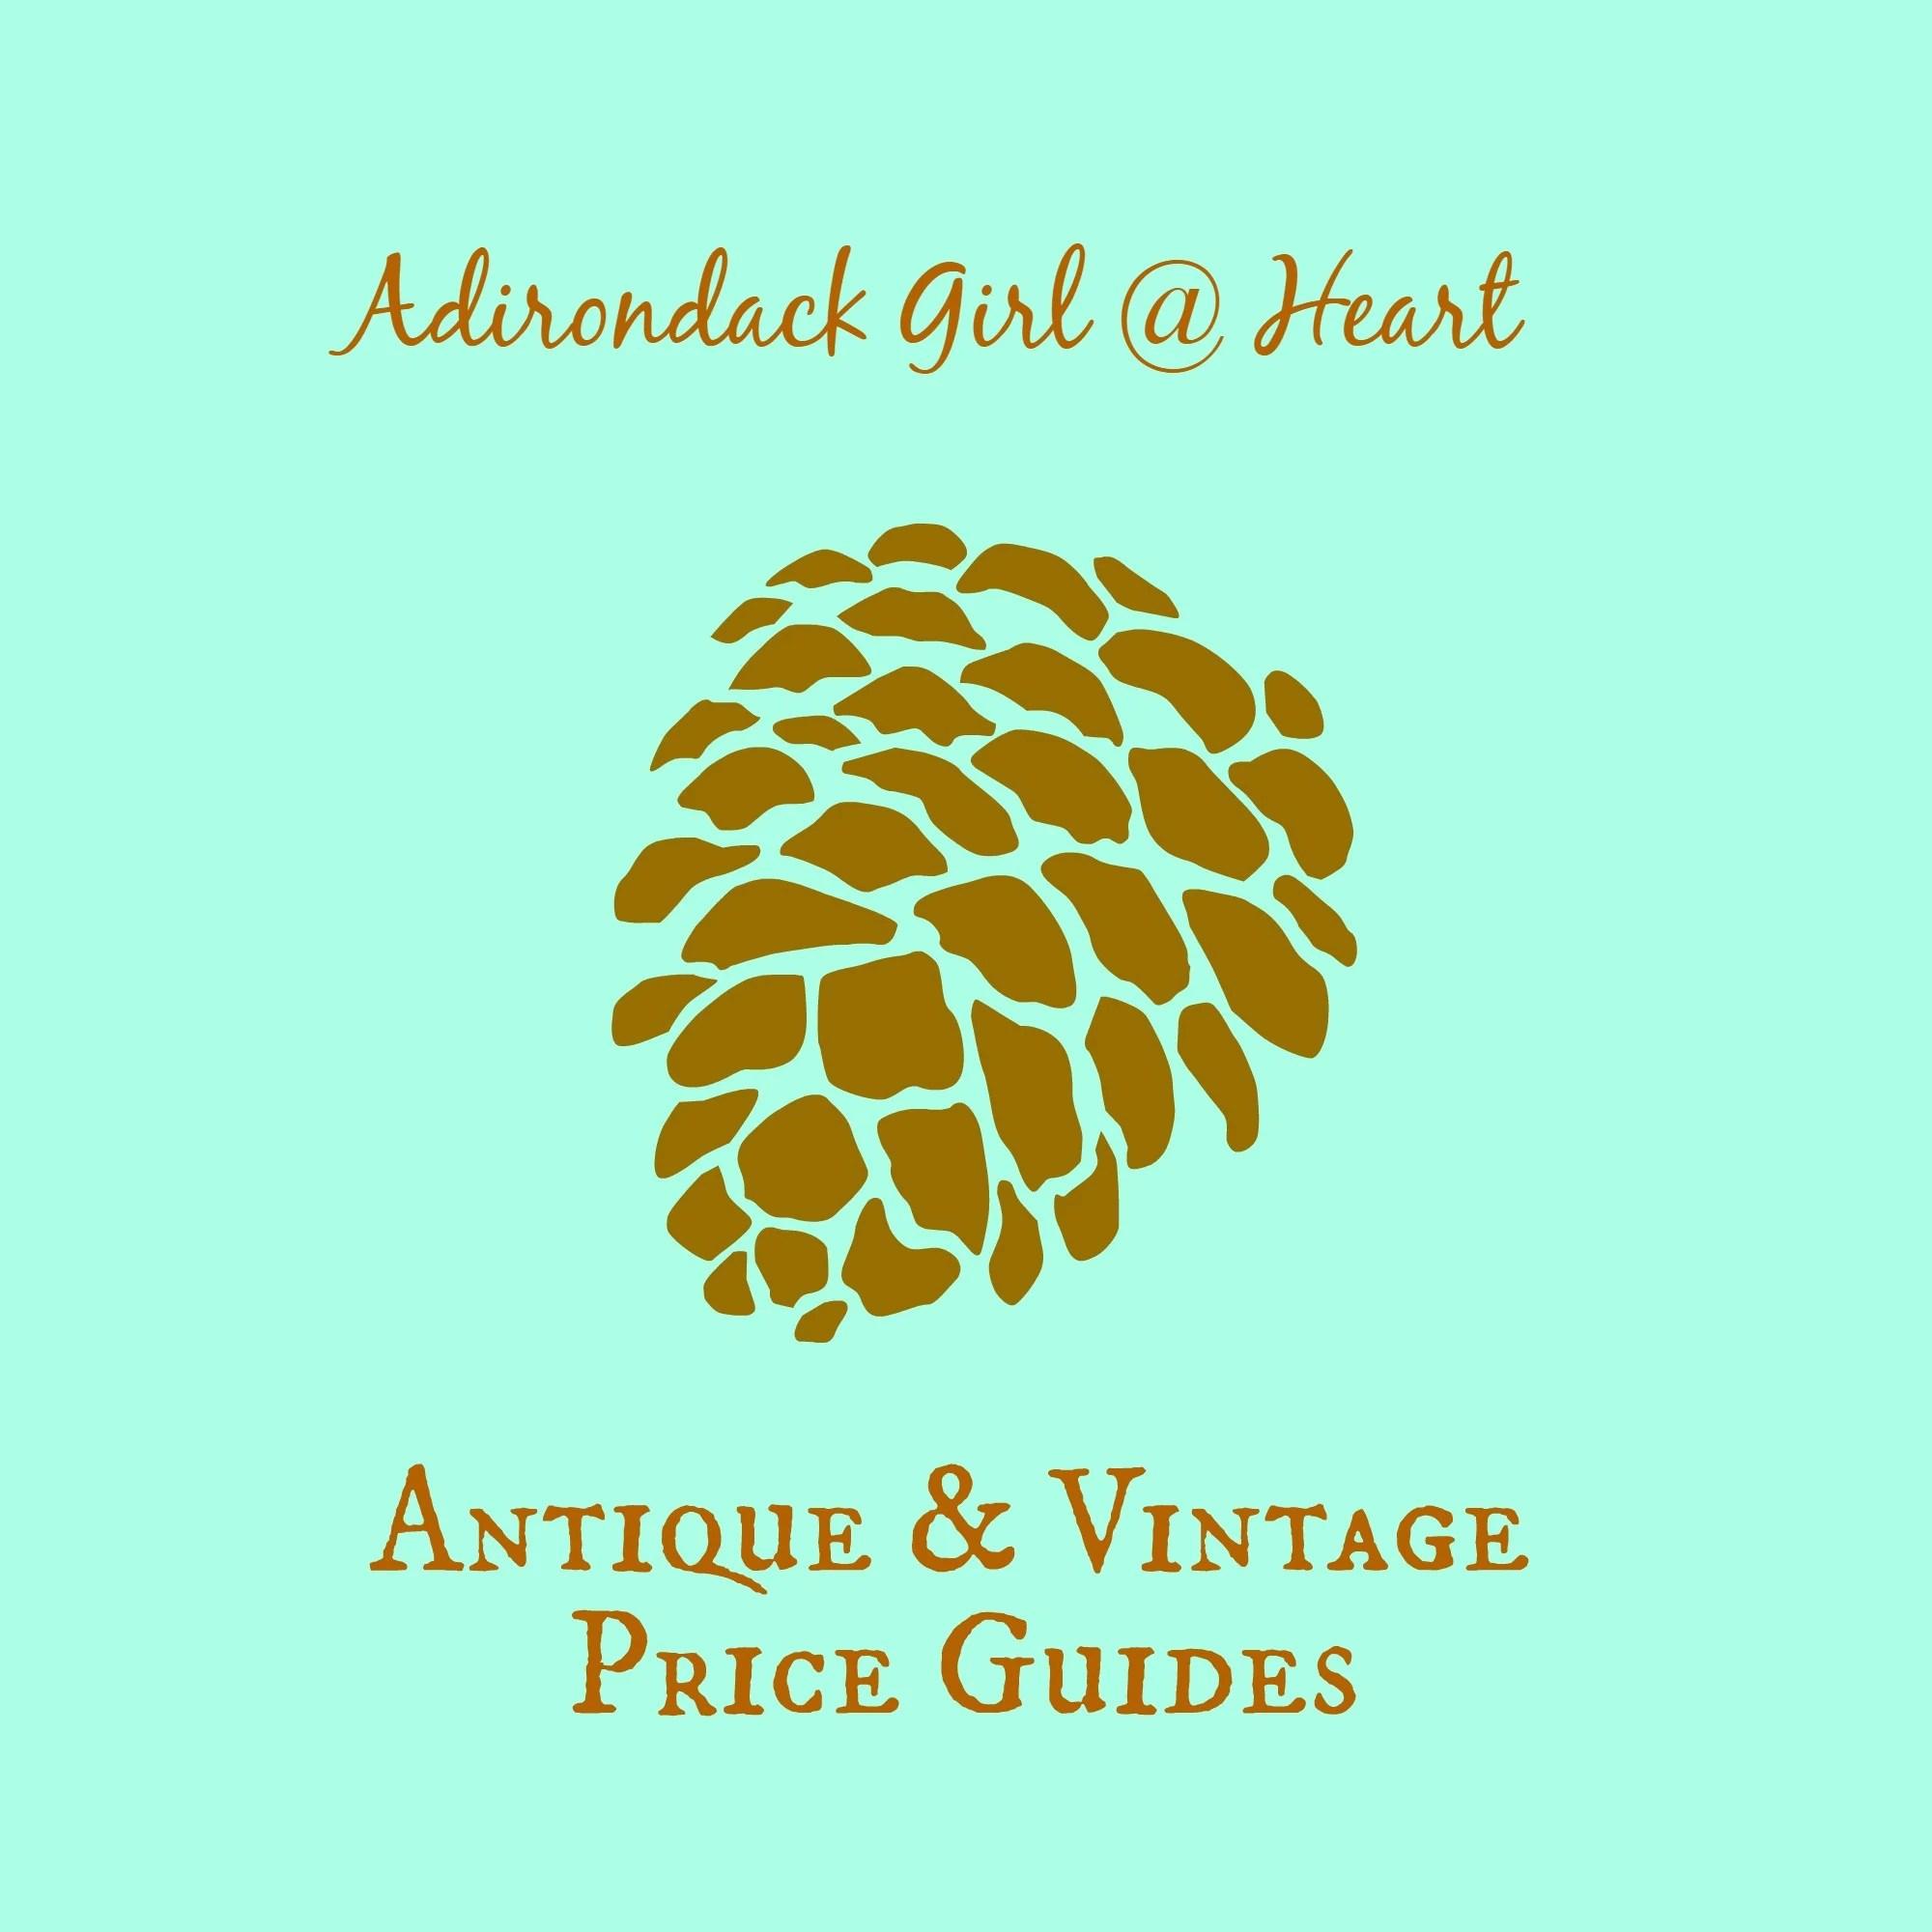 Adirondack Girl @ Heart Price Guides